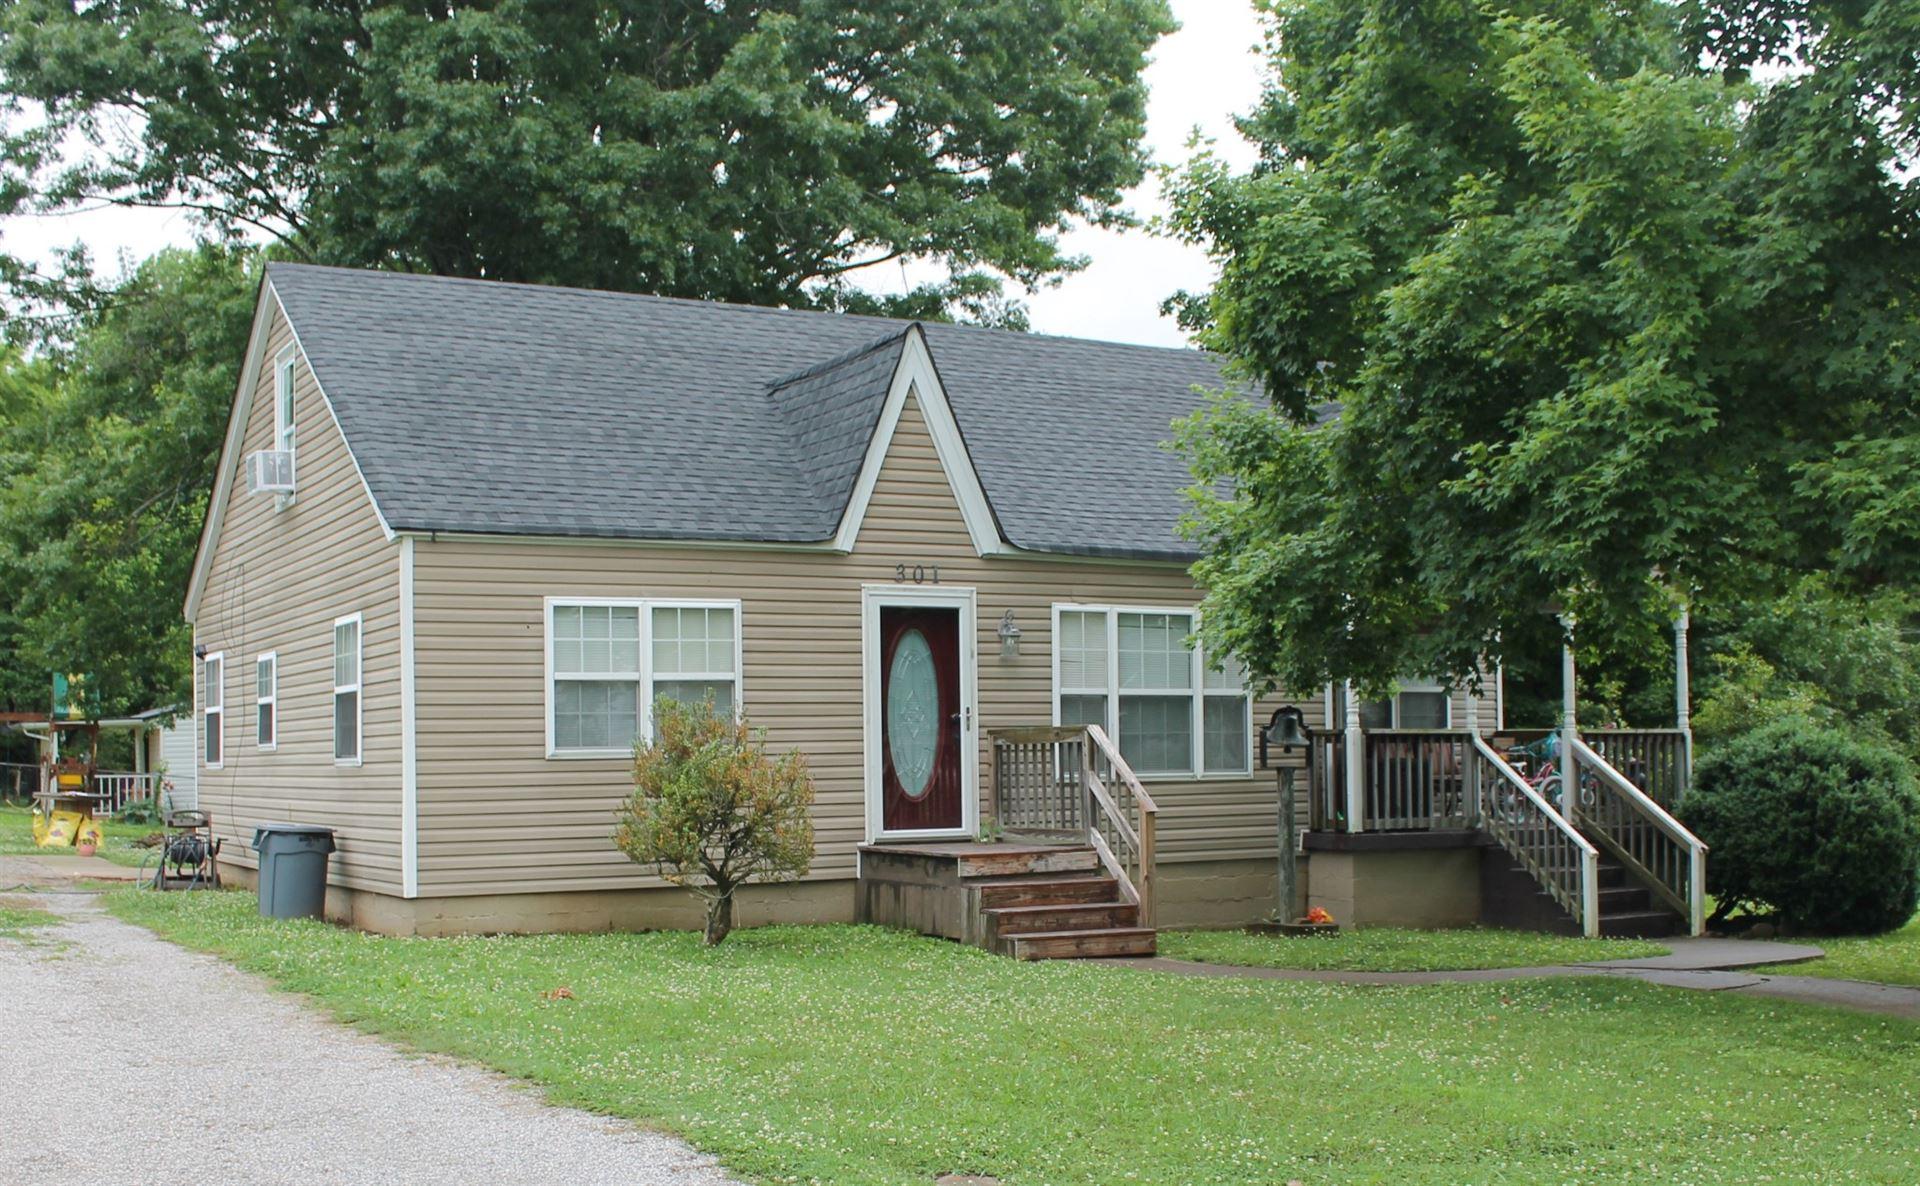 301 Crossover St, Columbia, TN 38401 - MLS#: 2260394